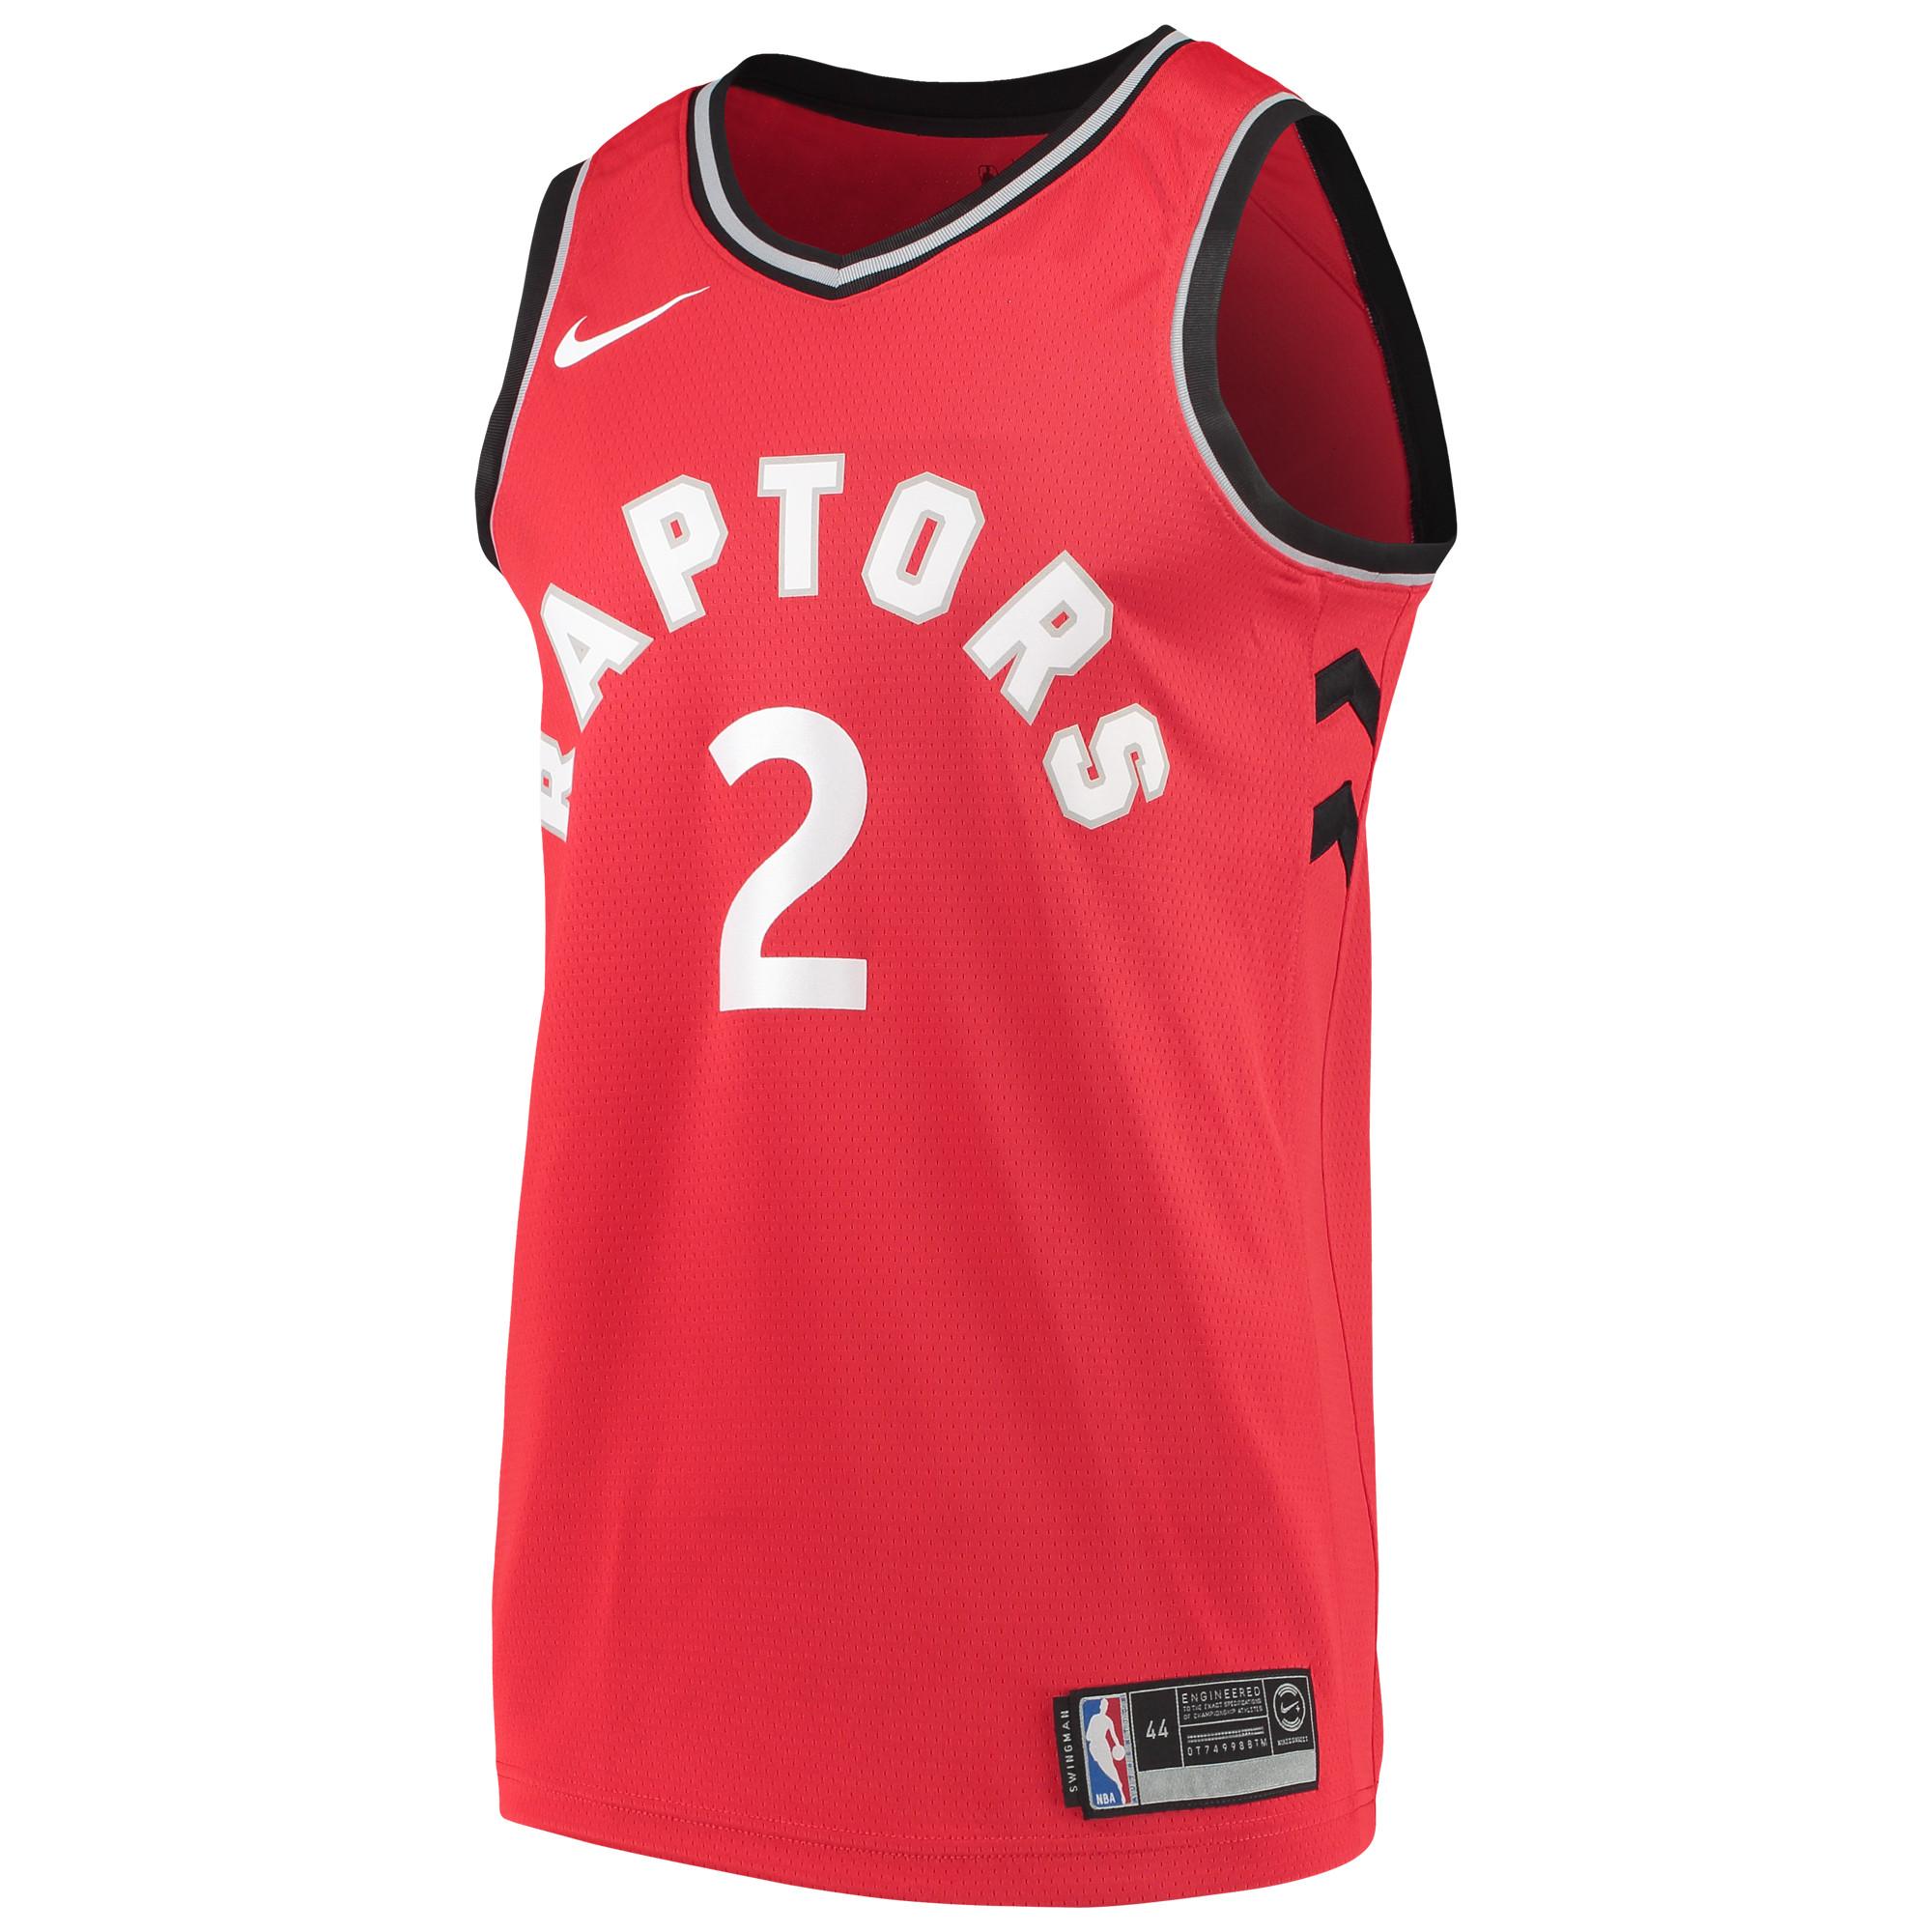 5388550fdd0d NBA Jerseys - Walmart.com